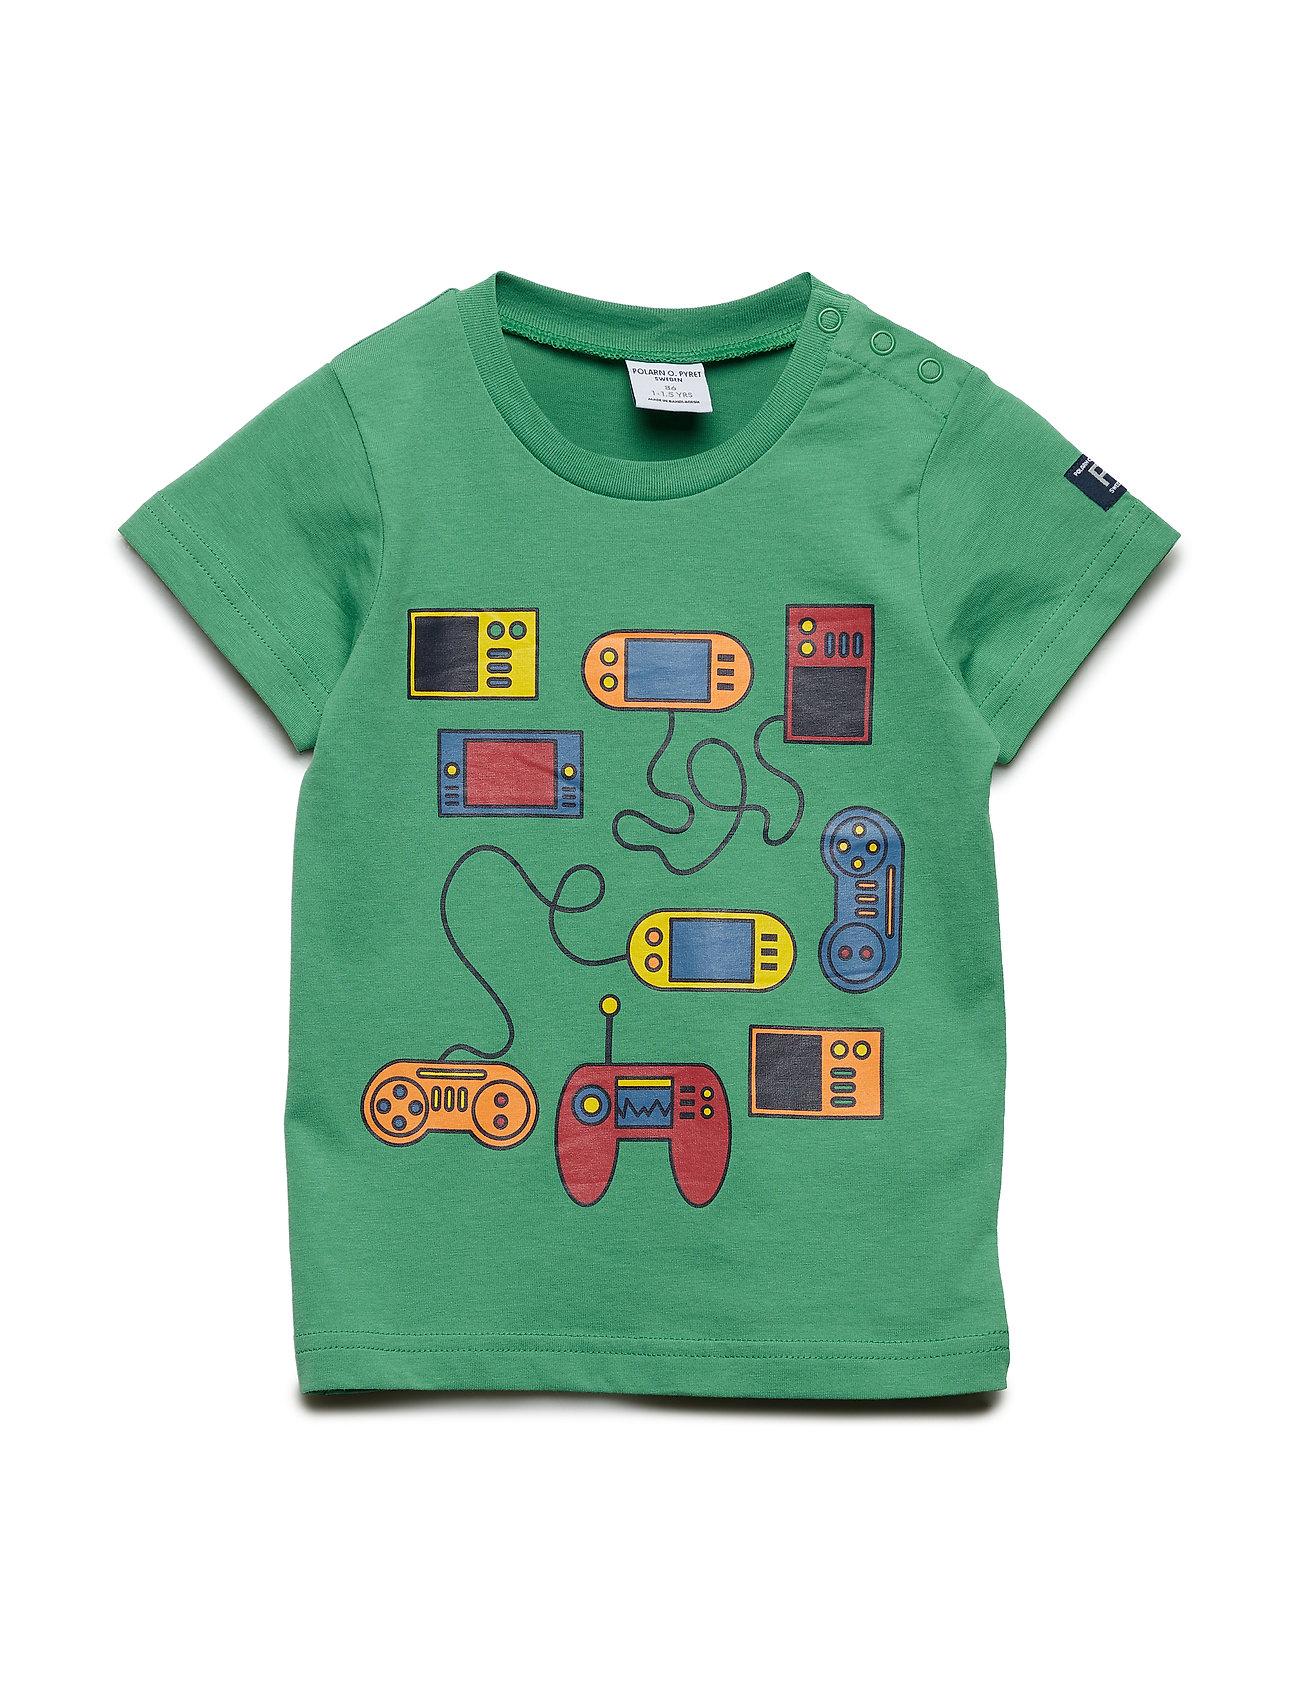 Polarn O. Pyret T-shirt Frontprint S/S Preschool - LEPRECHAUN